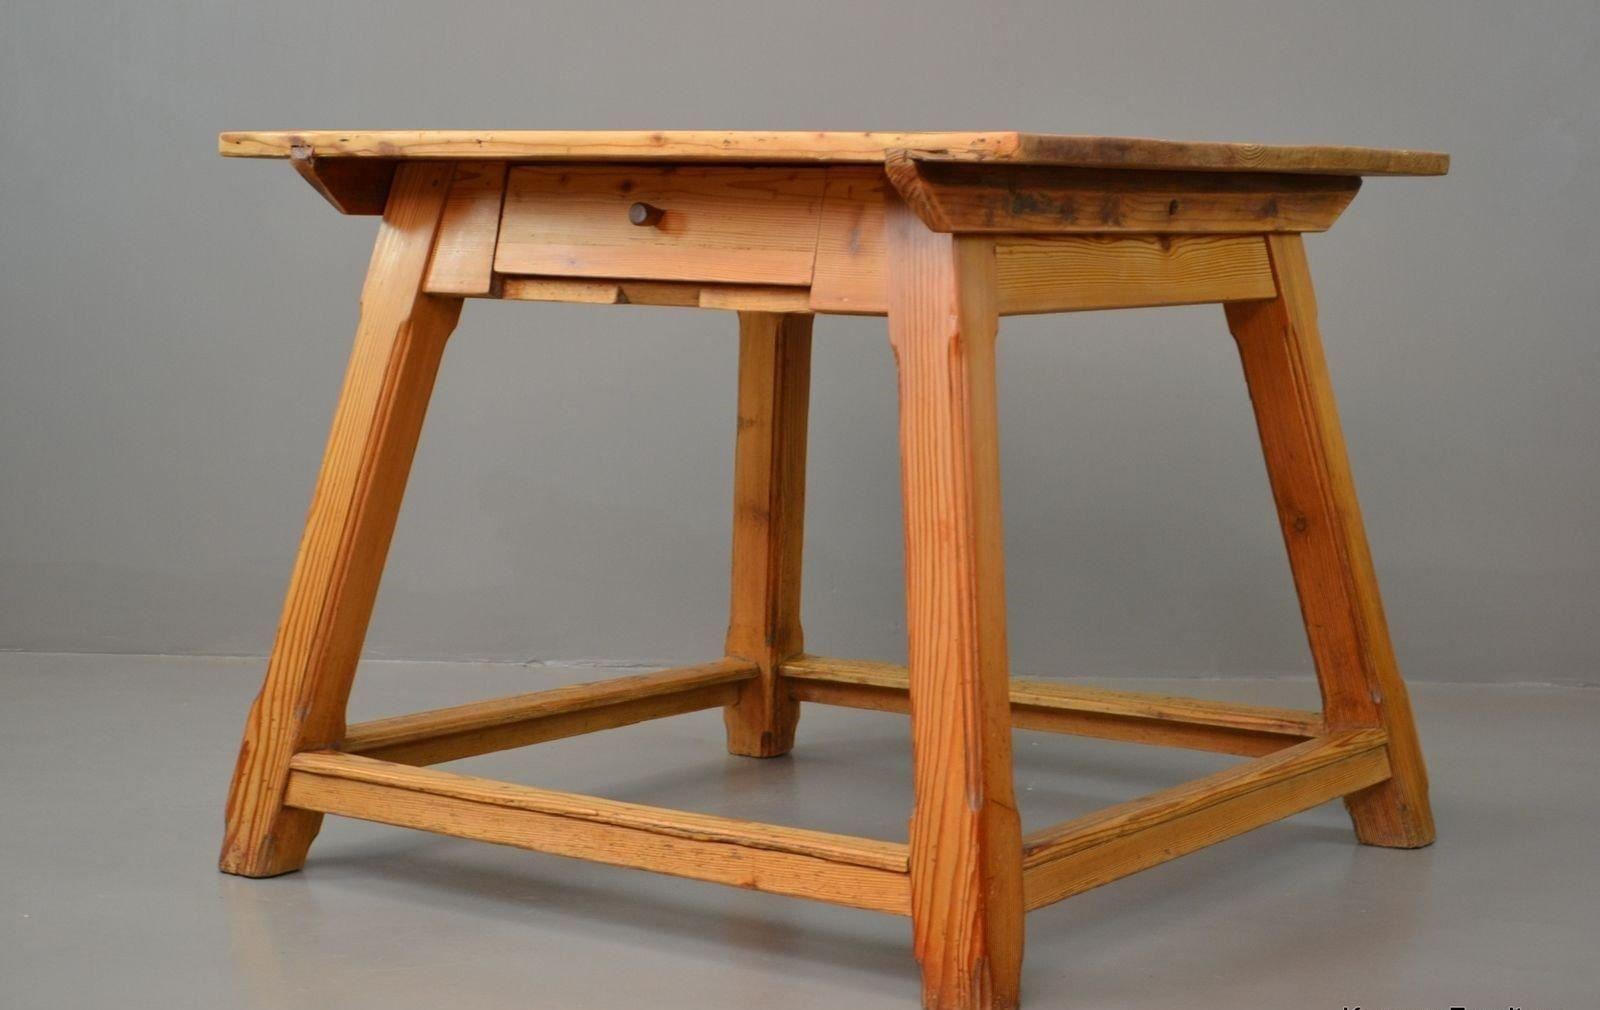 table de salle manger vintage arts crafts en pin en vente sur pamono. Black Bedroom Furniture Sets. Home Design Ideas